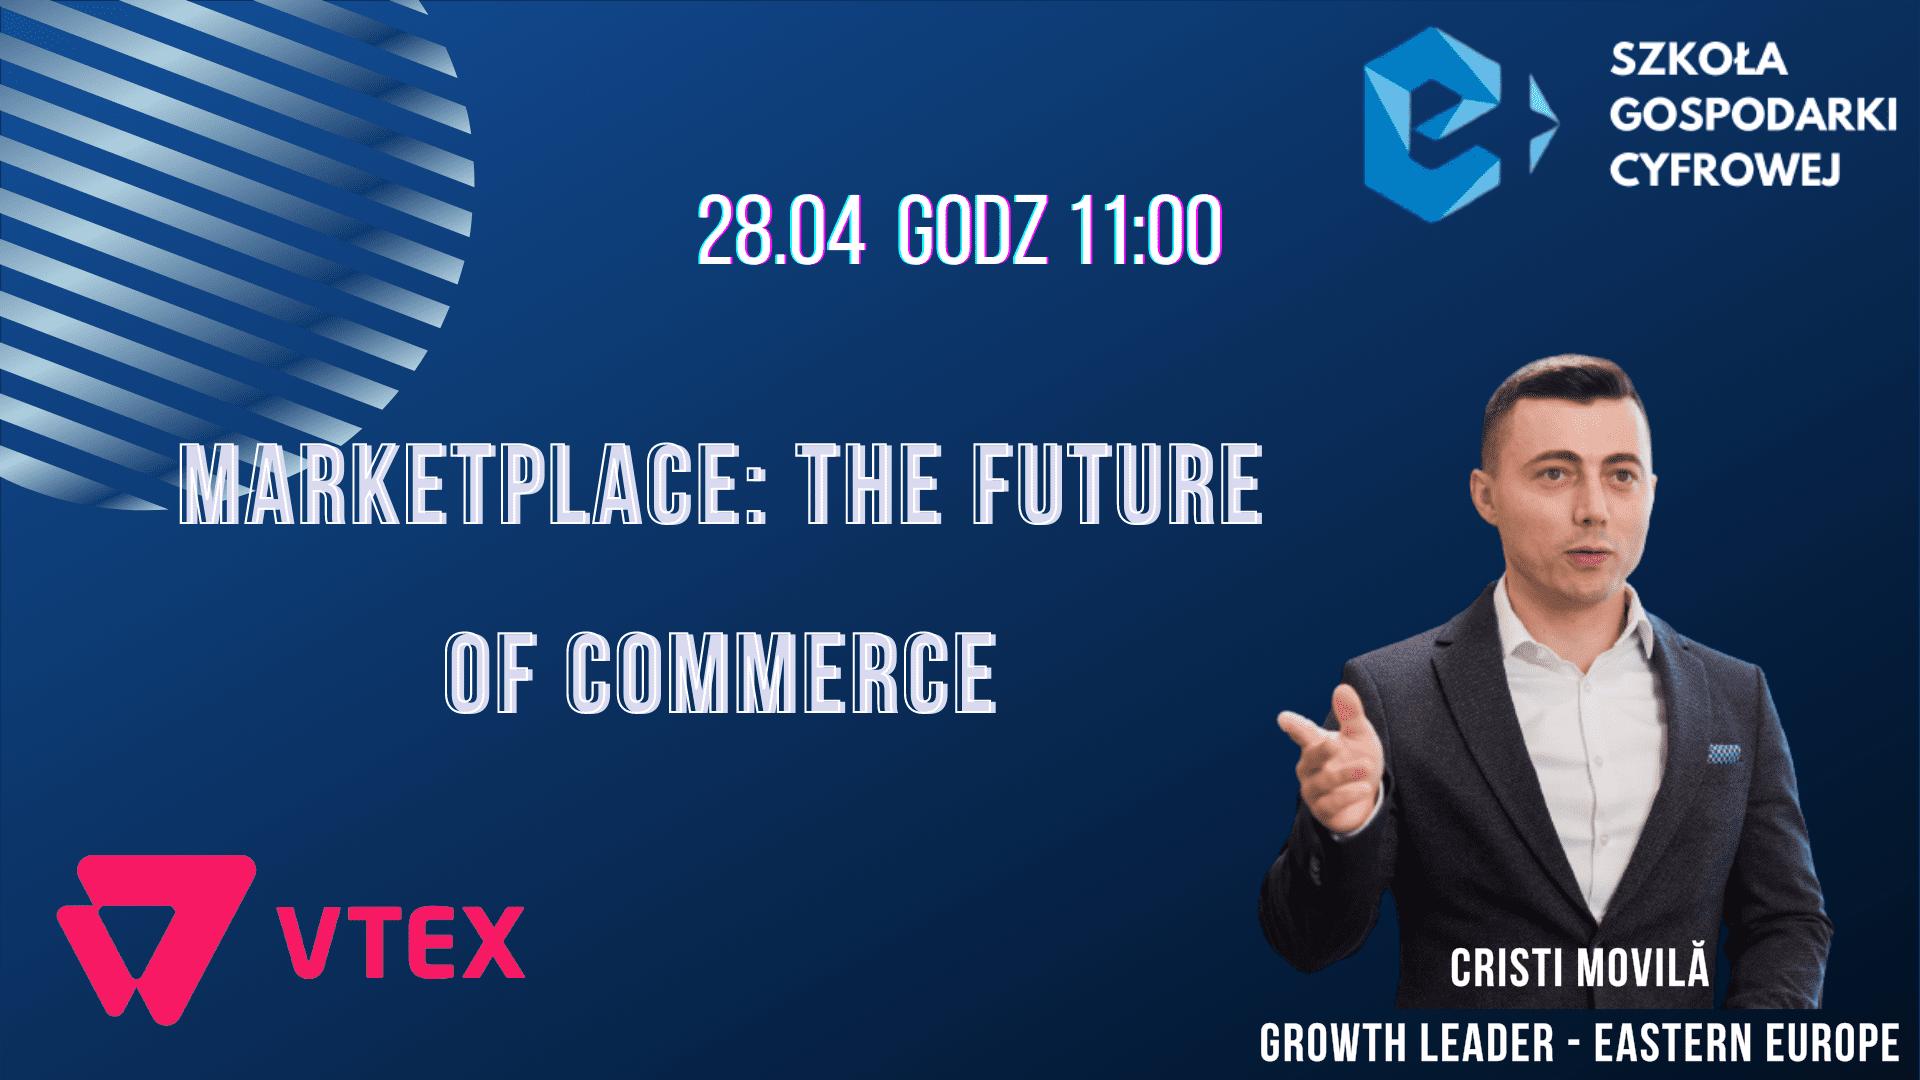 SGC: Marketplace: the future of commerce